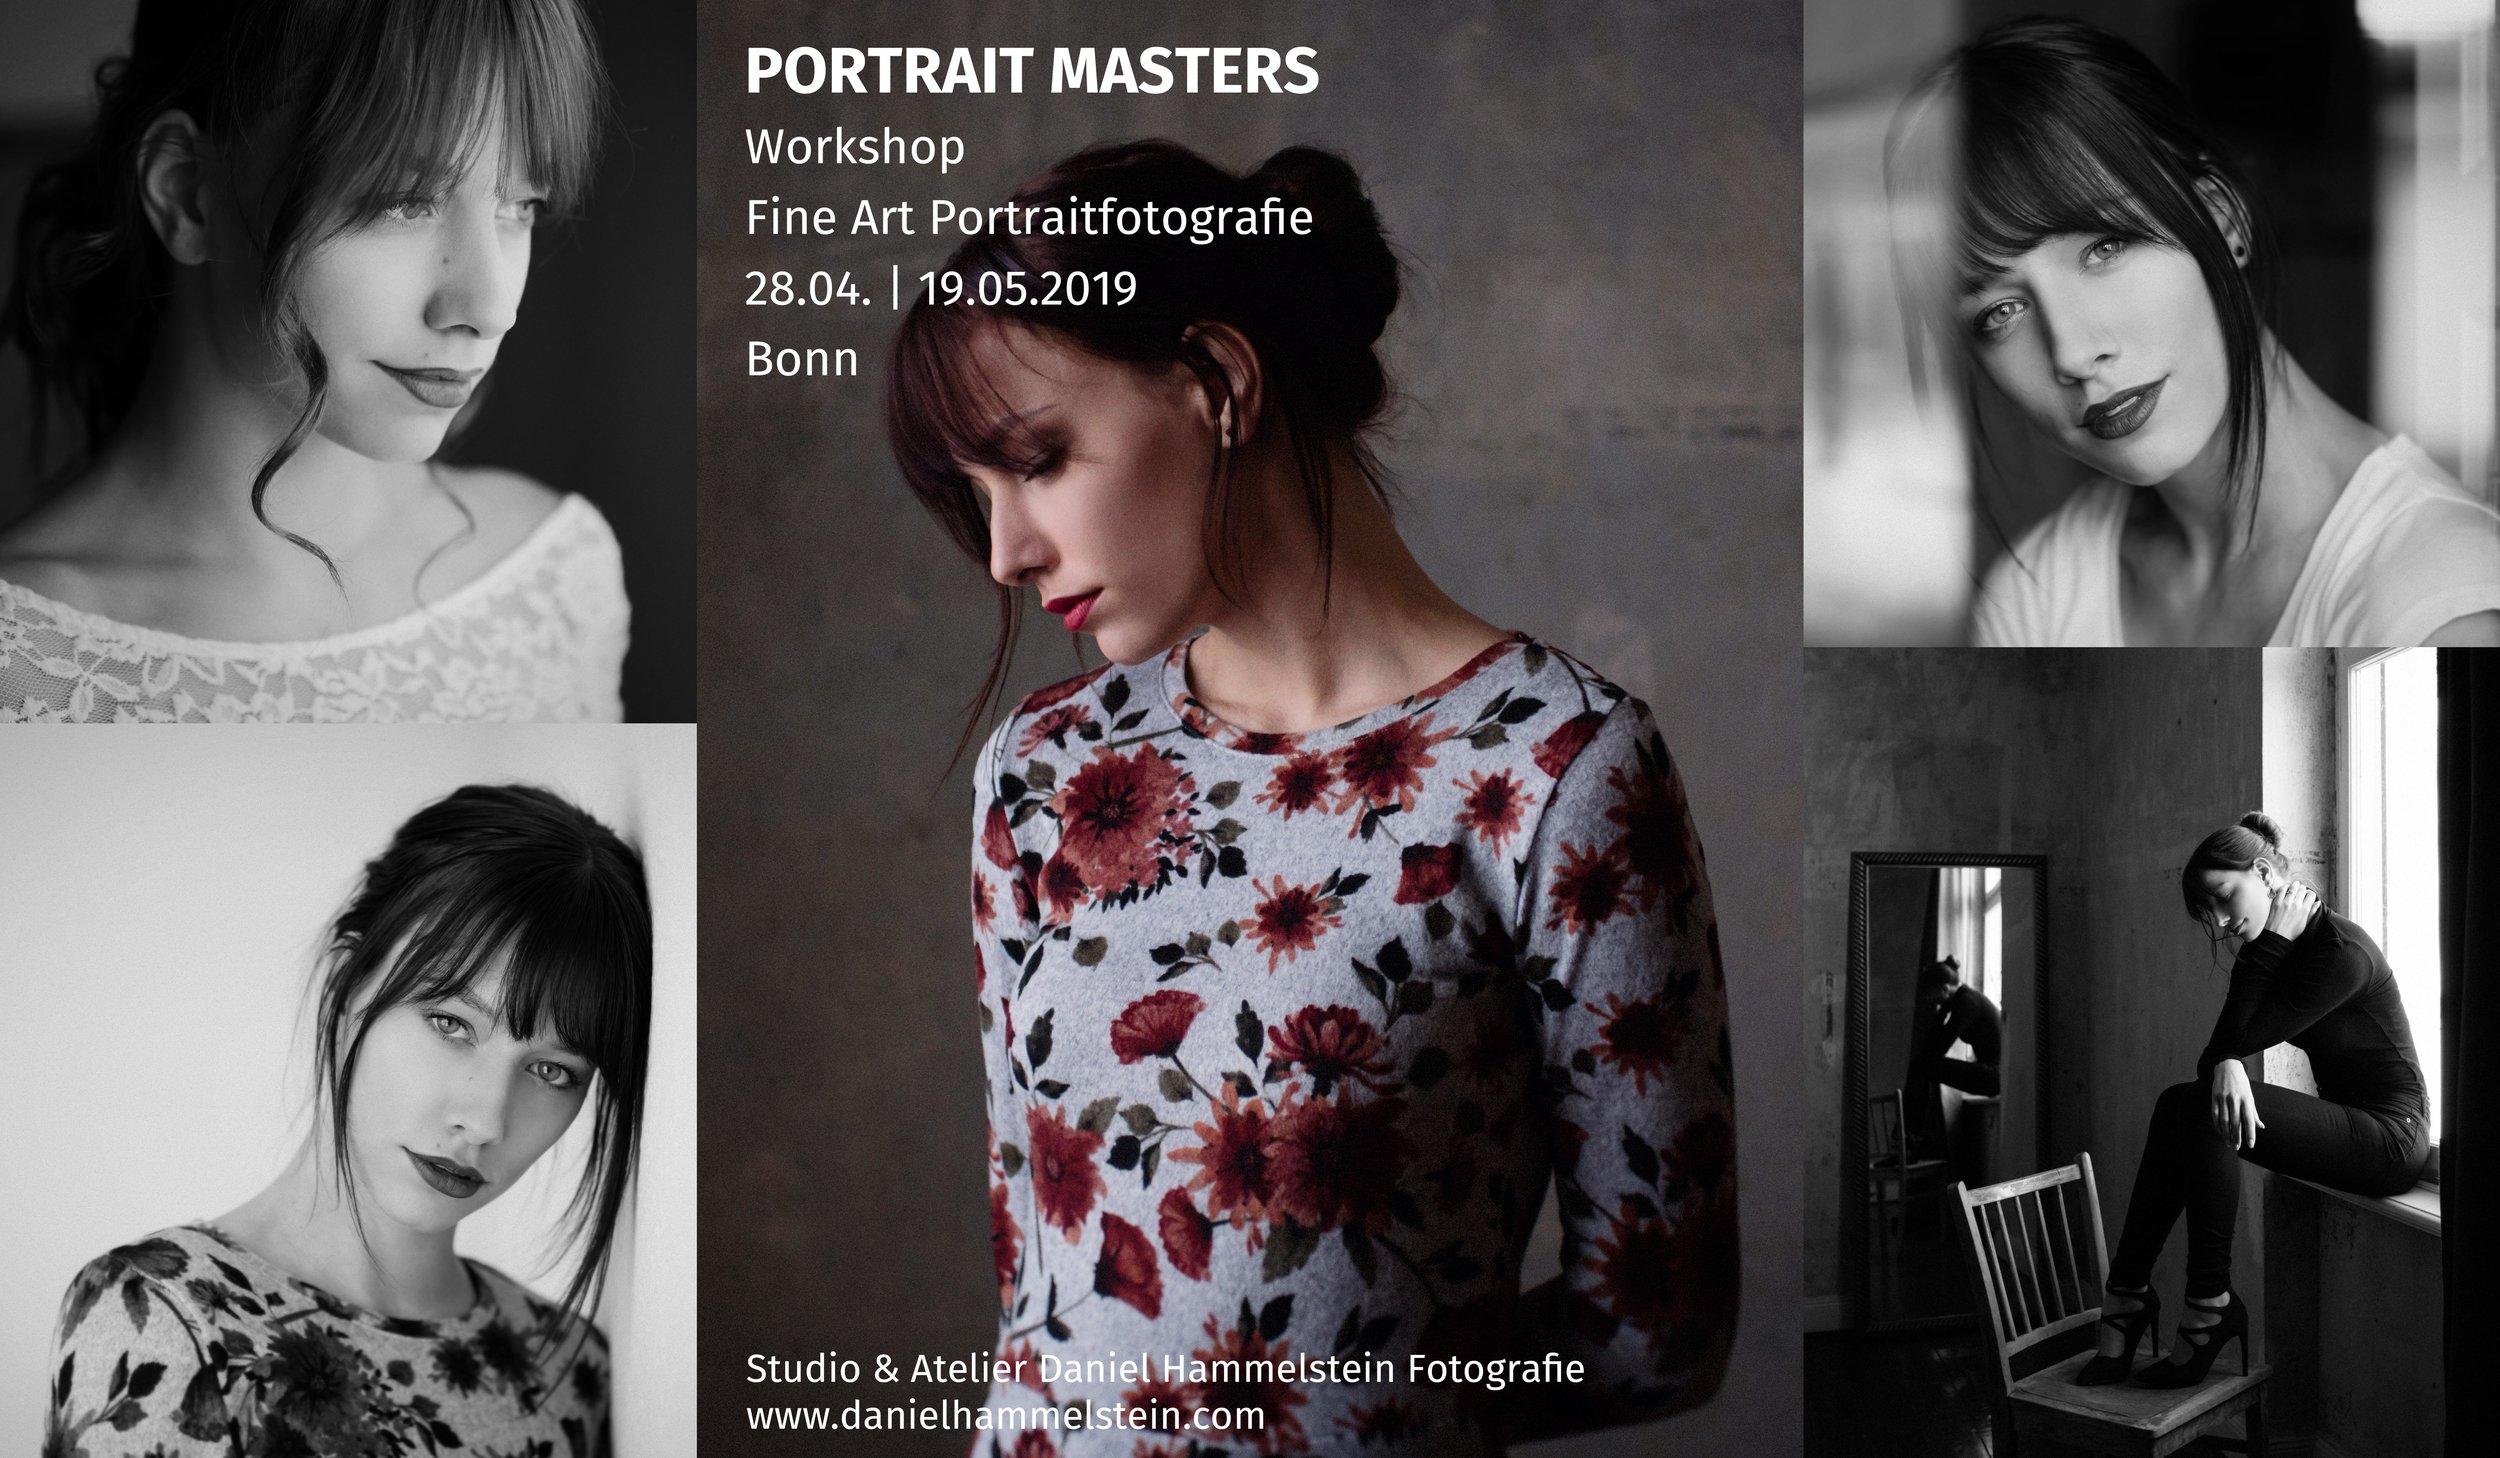 Portrait Workshop Portraitfotografie Schwarzweissfotografie Fotoworkshop Fotokurs Bonn Köln Düsseldorf NRW April Mai 2019.jpg